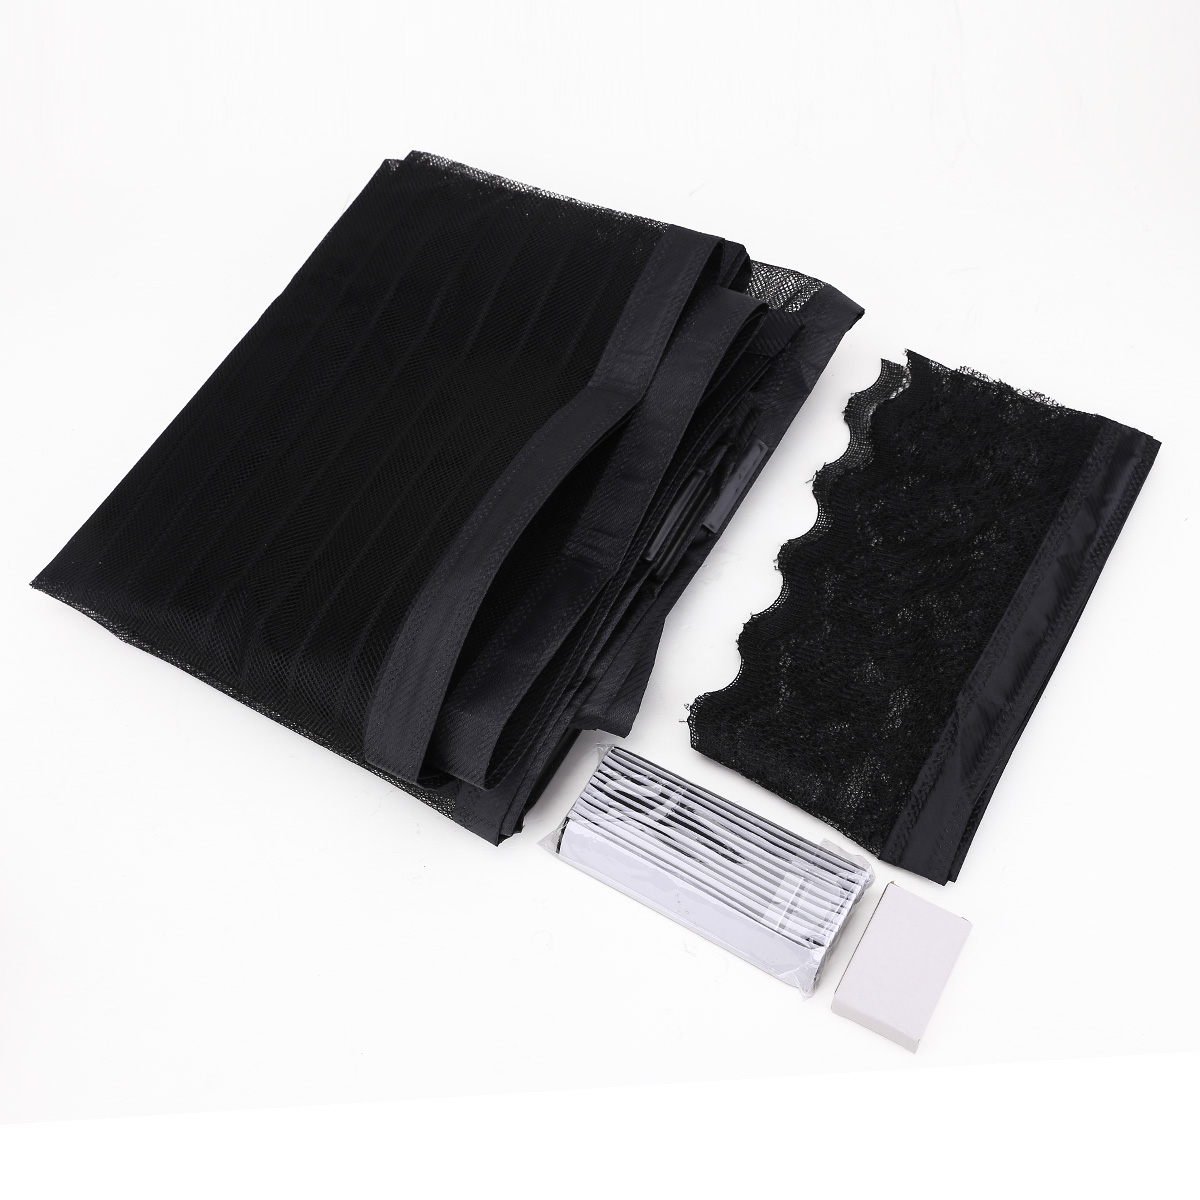 moskitonetz fliegengitter fliegen gitter magnete moskito vorhang t r 220cm ebay. Black Bedroom Furniture Sets. Home Design Ideas